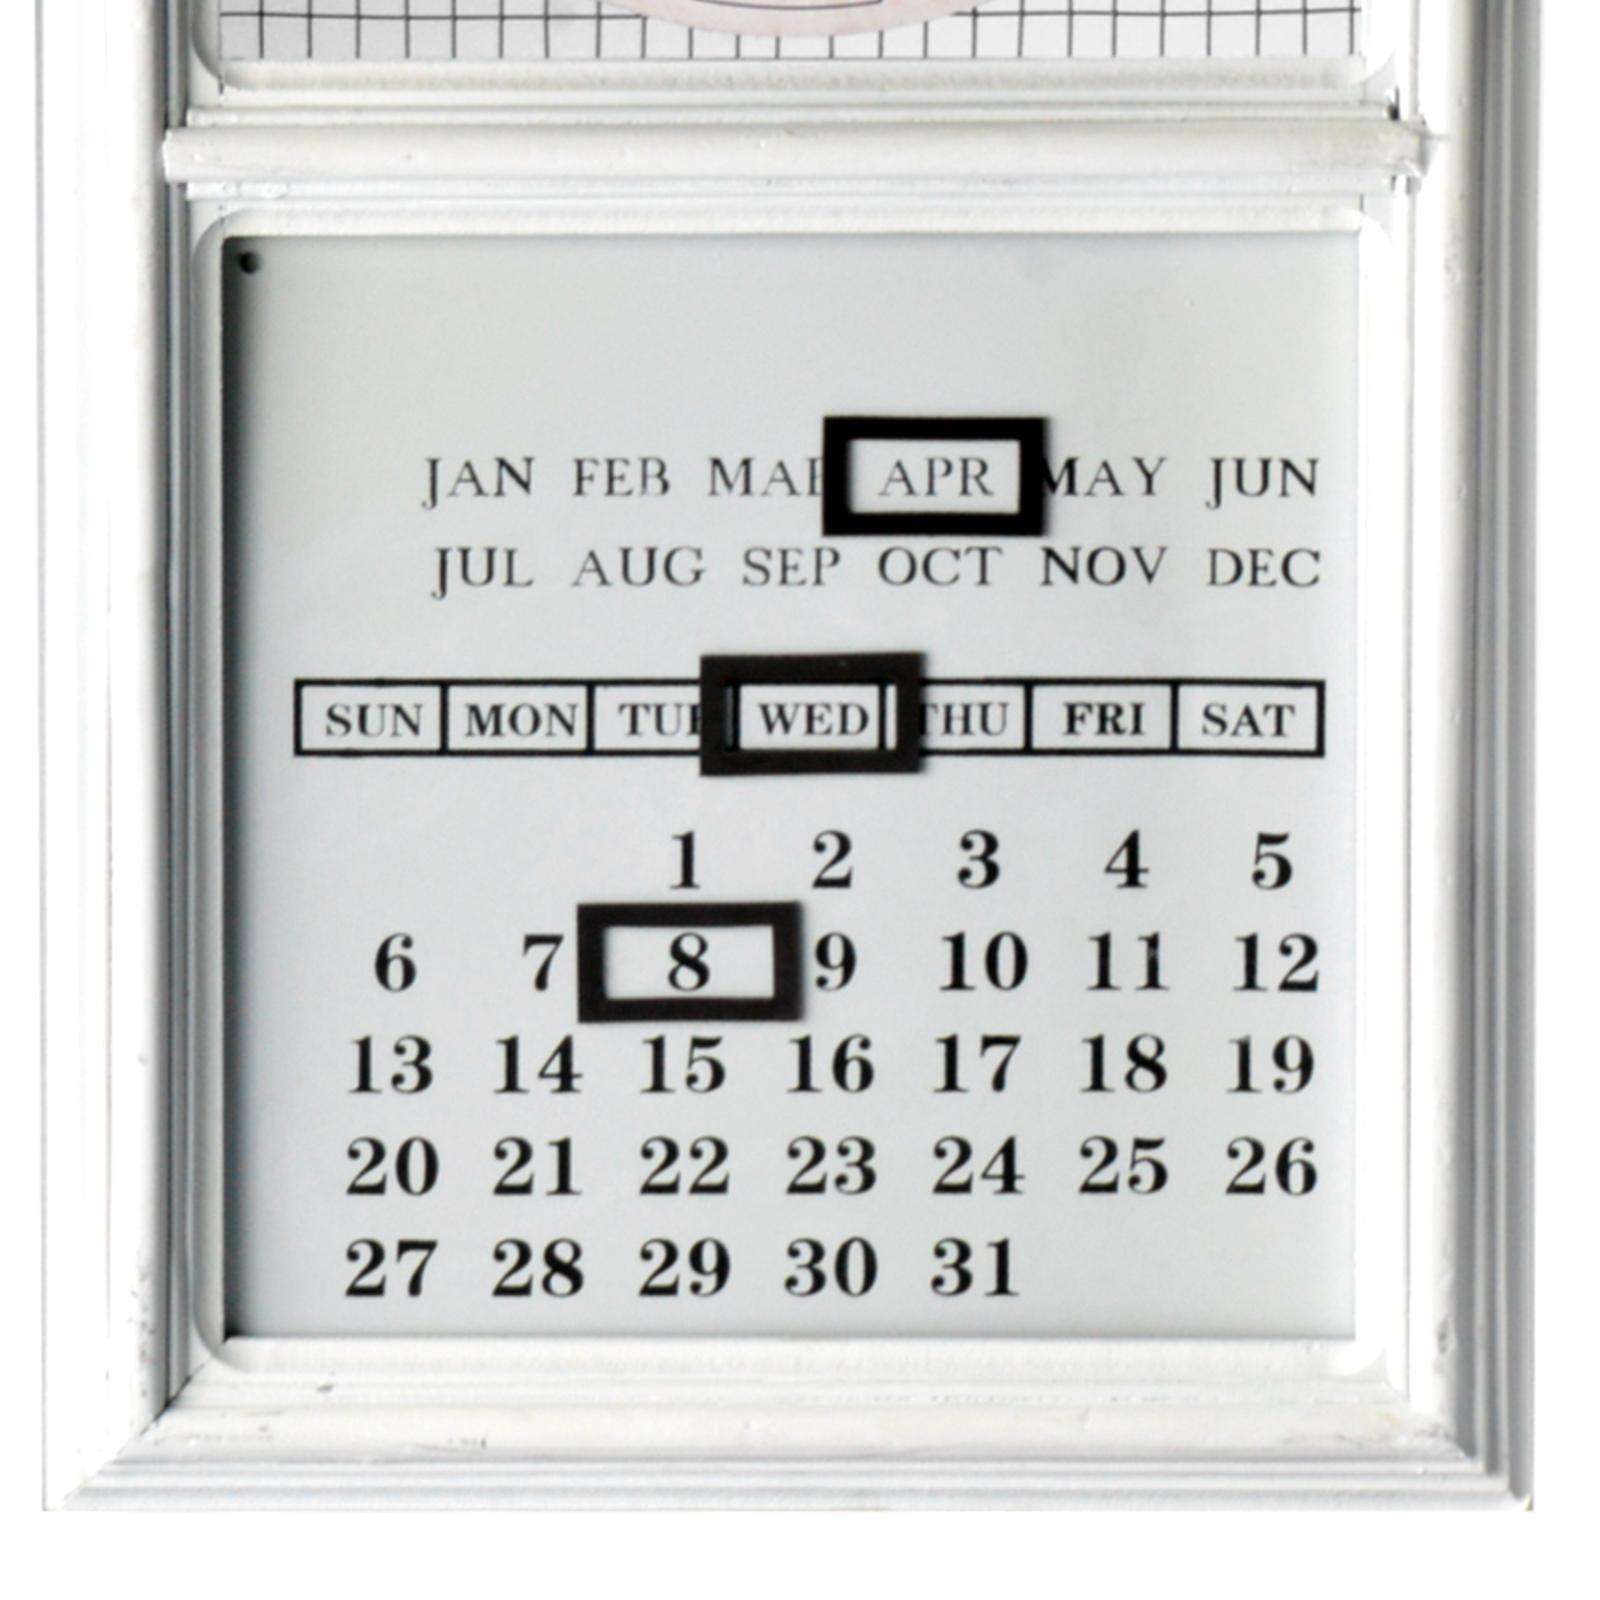 2 mod les horloge murale avec calendrier permanent vintage - Horloge murale avec calendrier ...